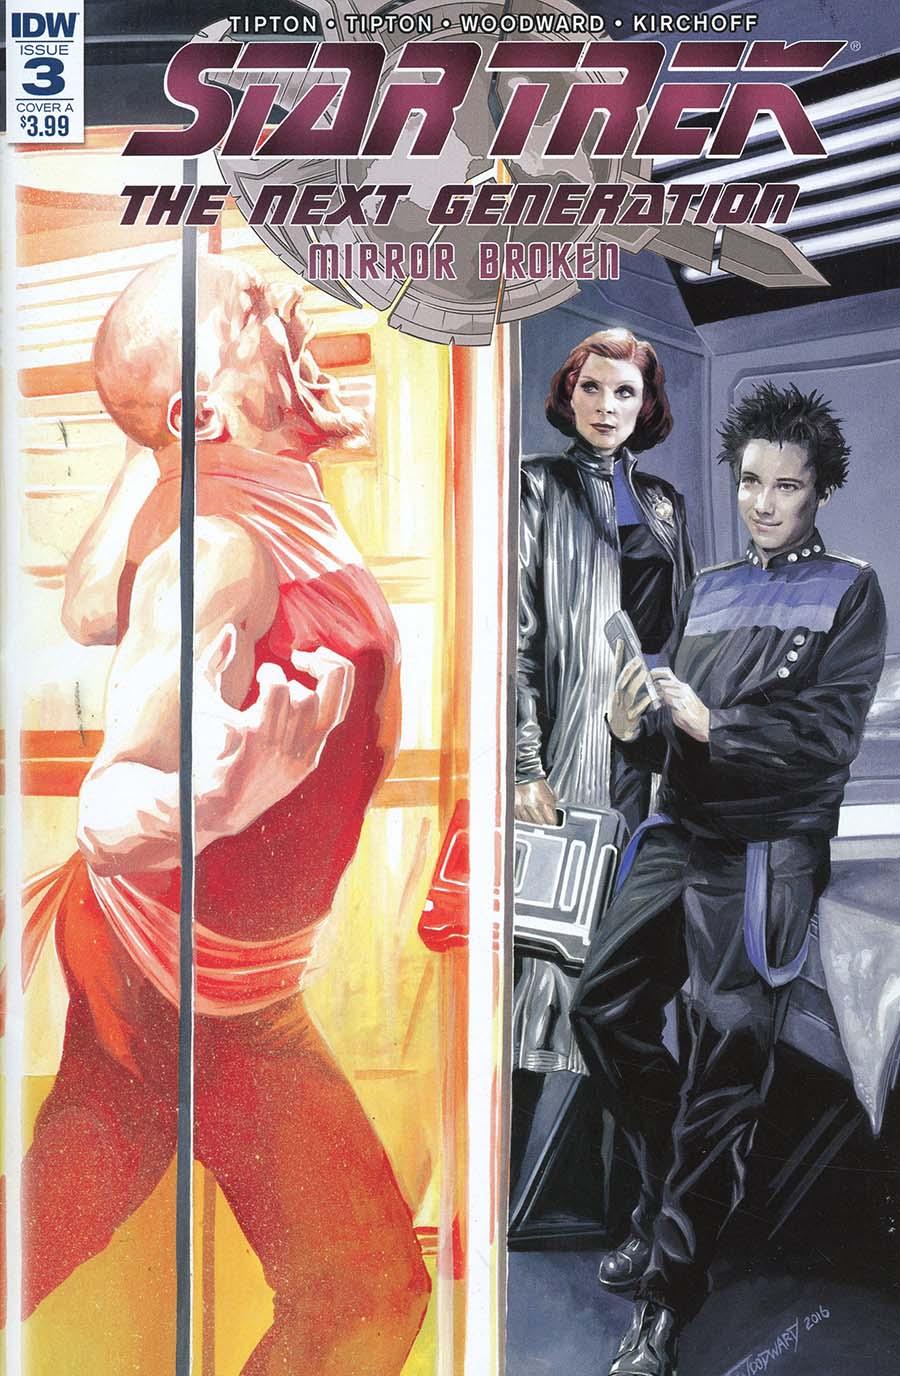 Star Trek The Next Generation Mirror Broken #3 Cover A Regular JK Woodward Cover